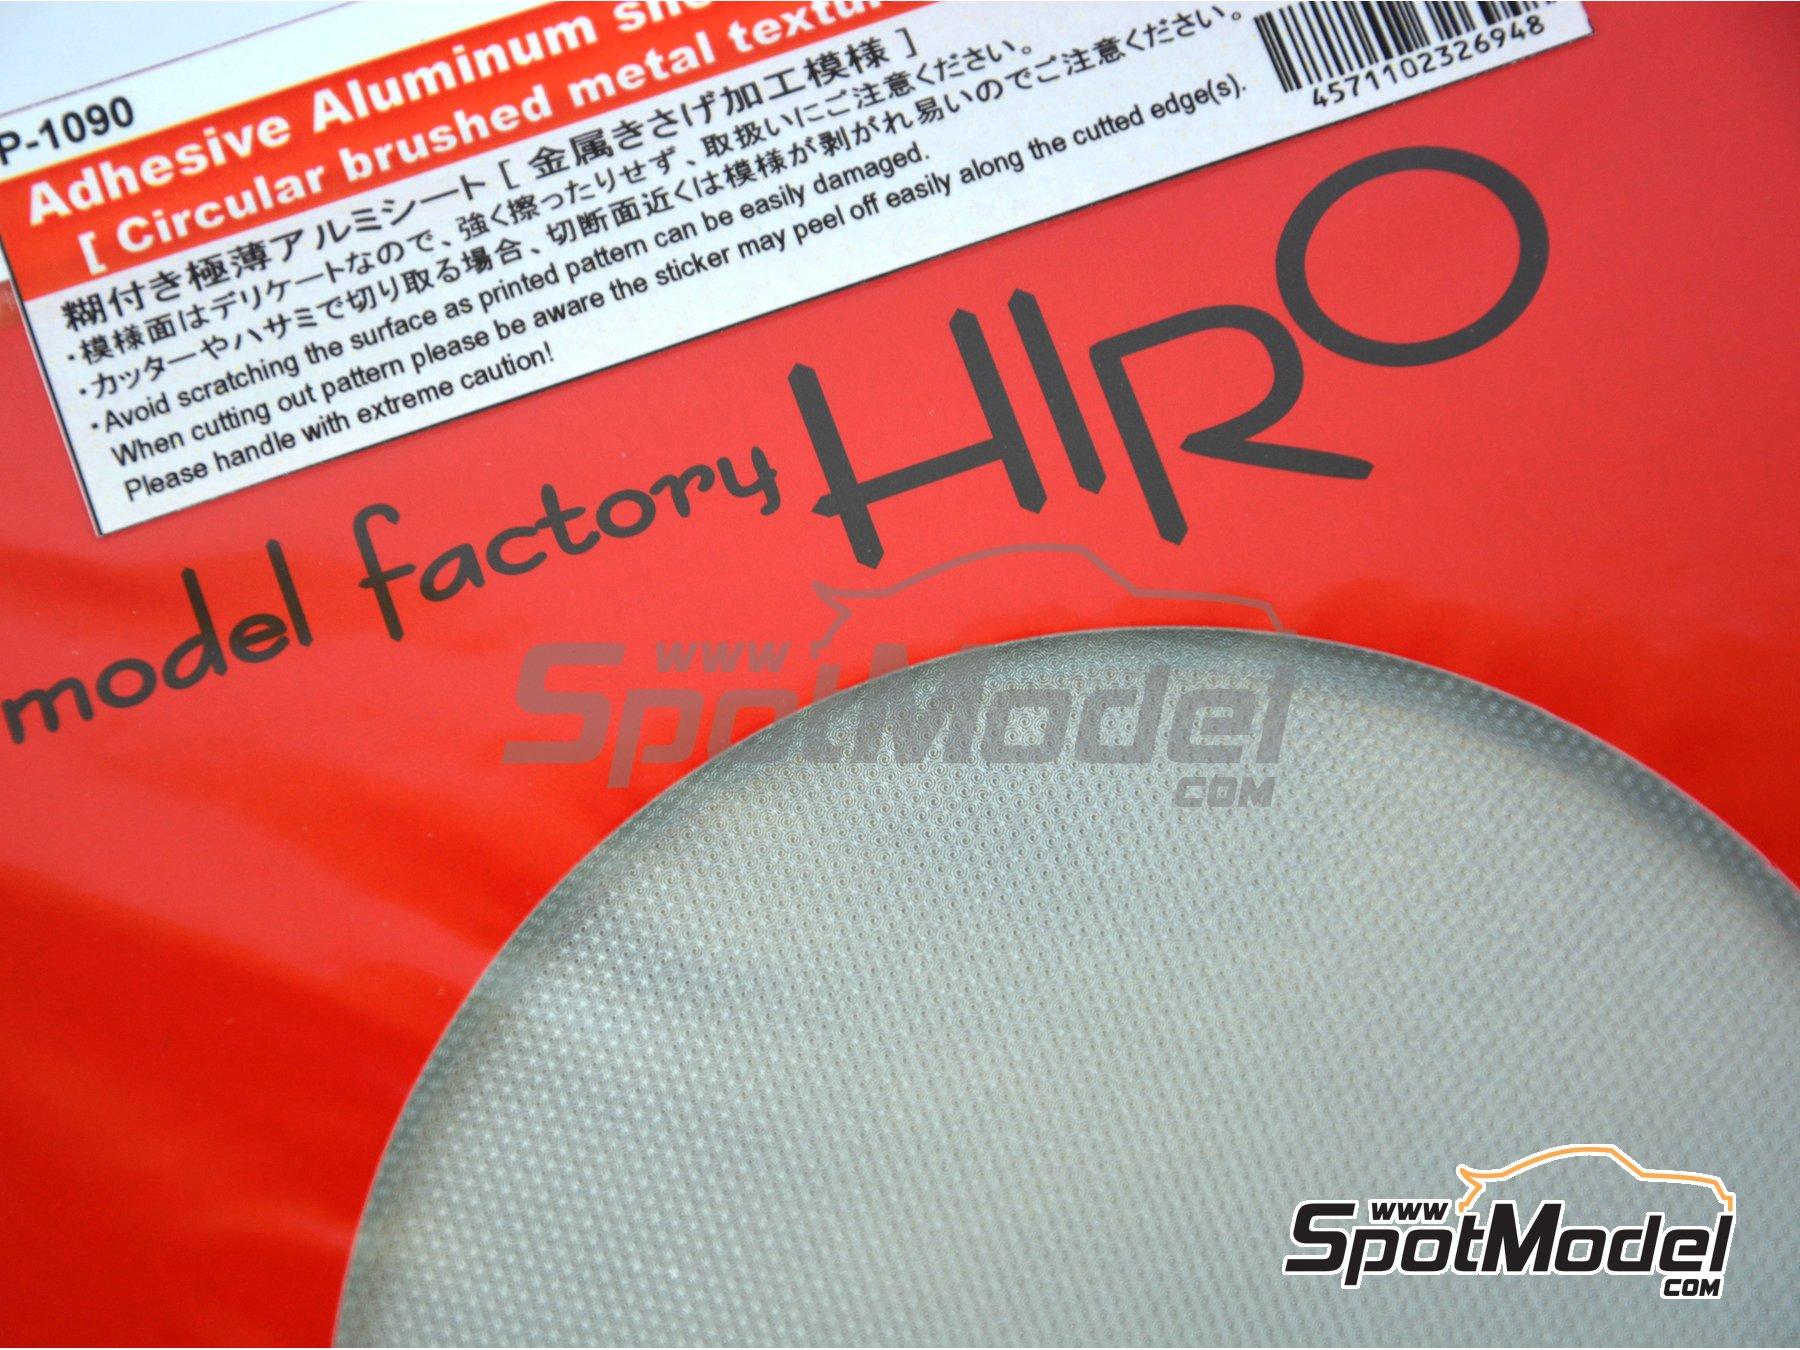 Image 2: Aluminio con cepillado circular - trama pequeña | Material fabricado por Model Factory Hiro (ref.MFH-P1090)